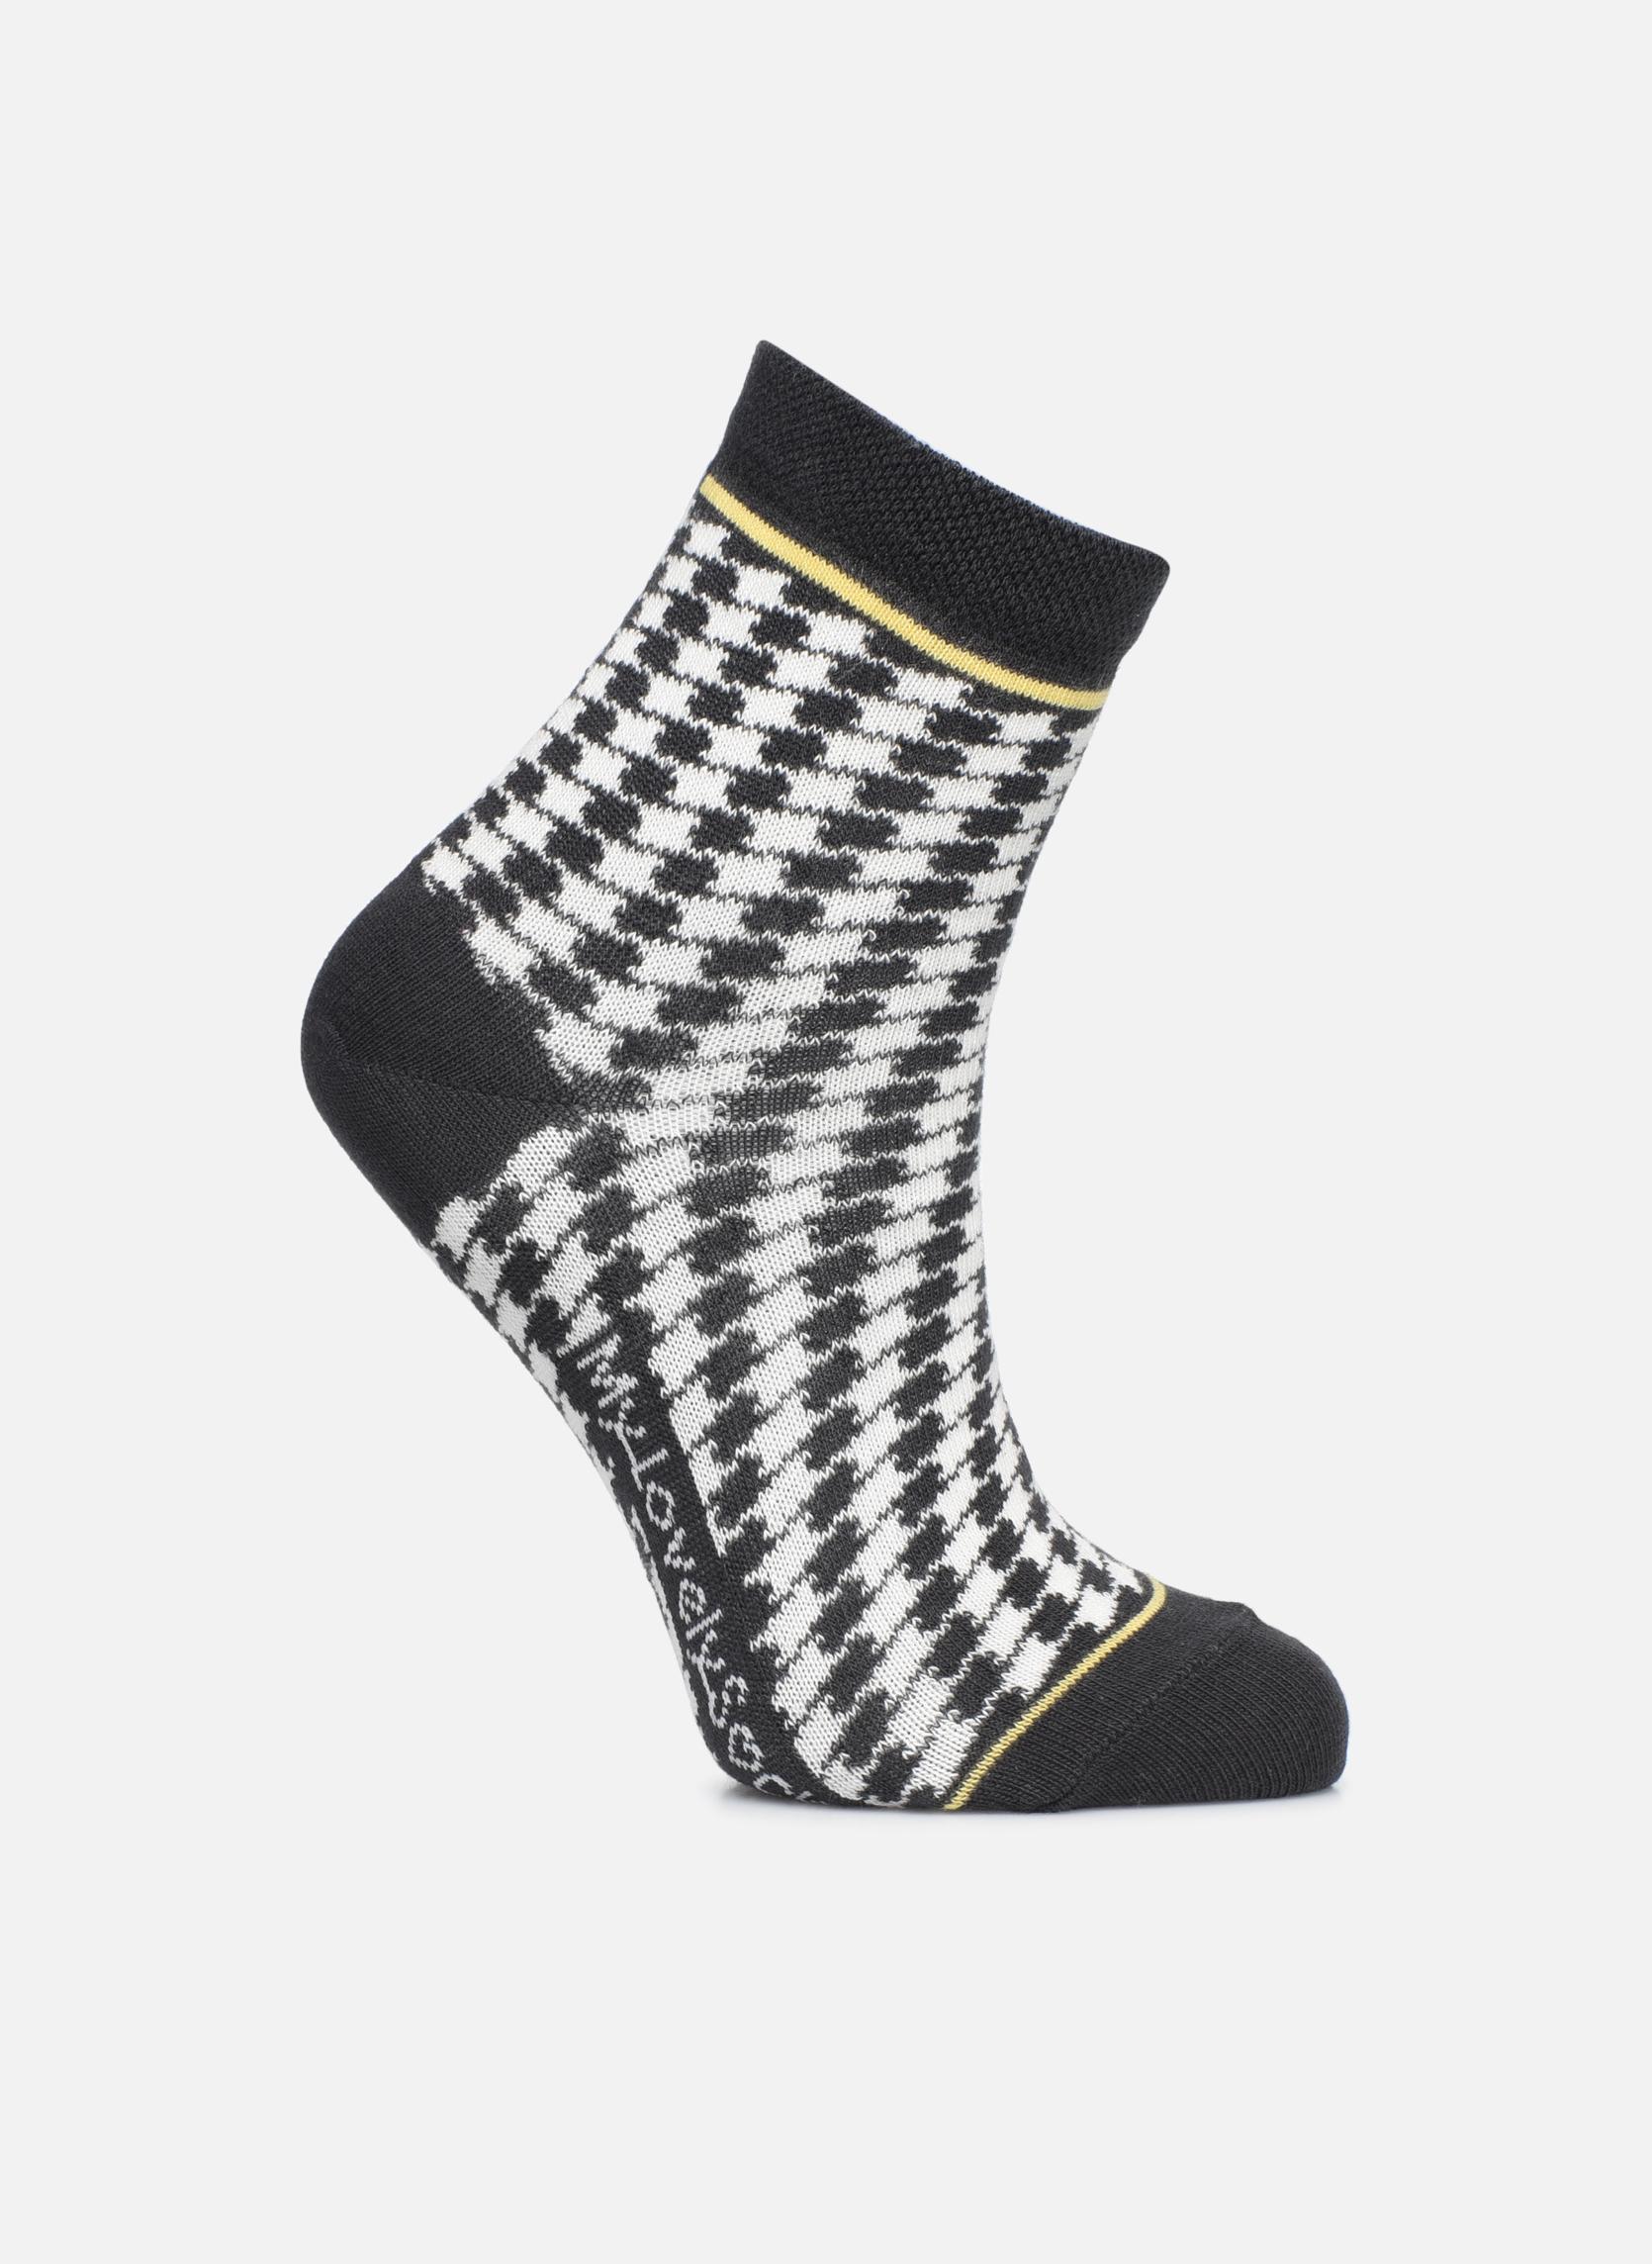 My Lovely Socks Zoe